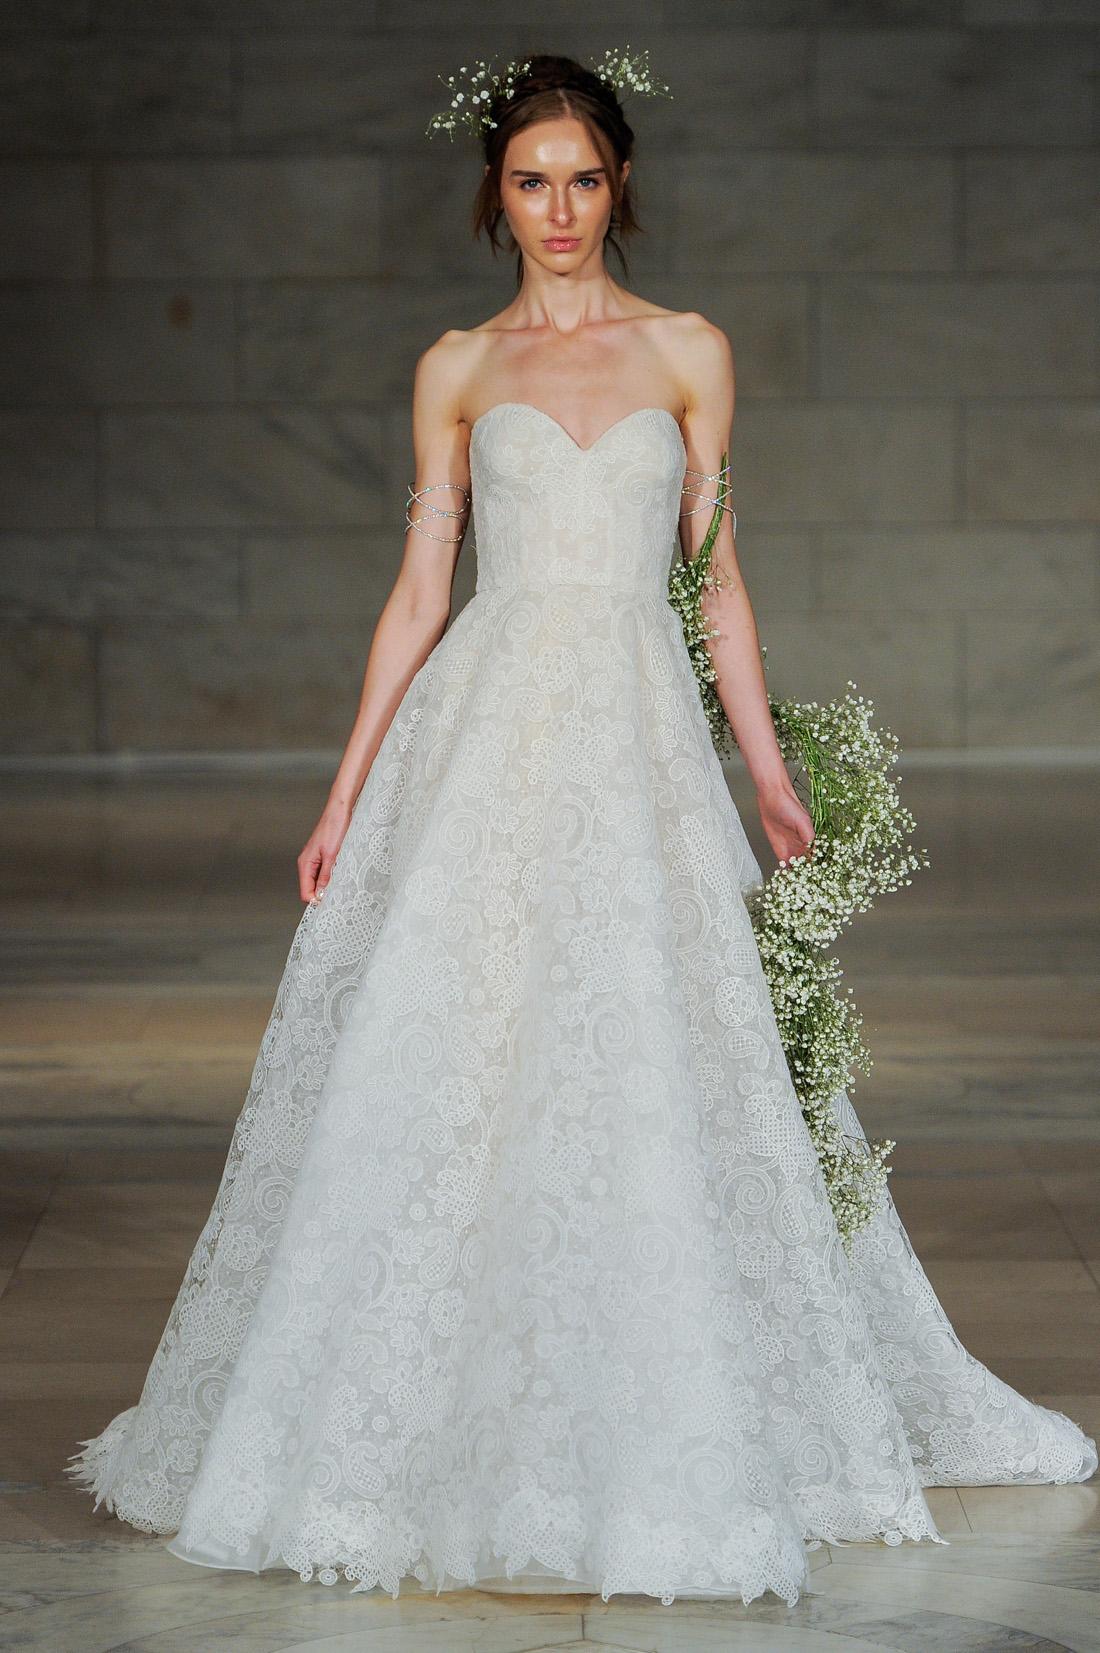 Reem acra wedding dress sweetheart neckline bridal gown ideas